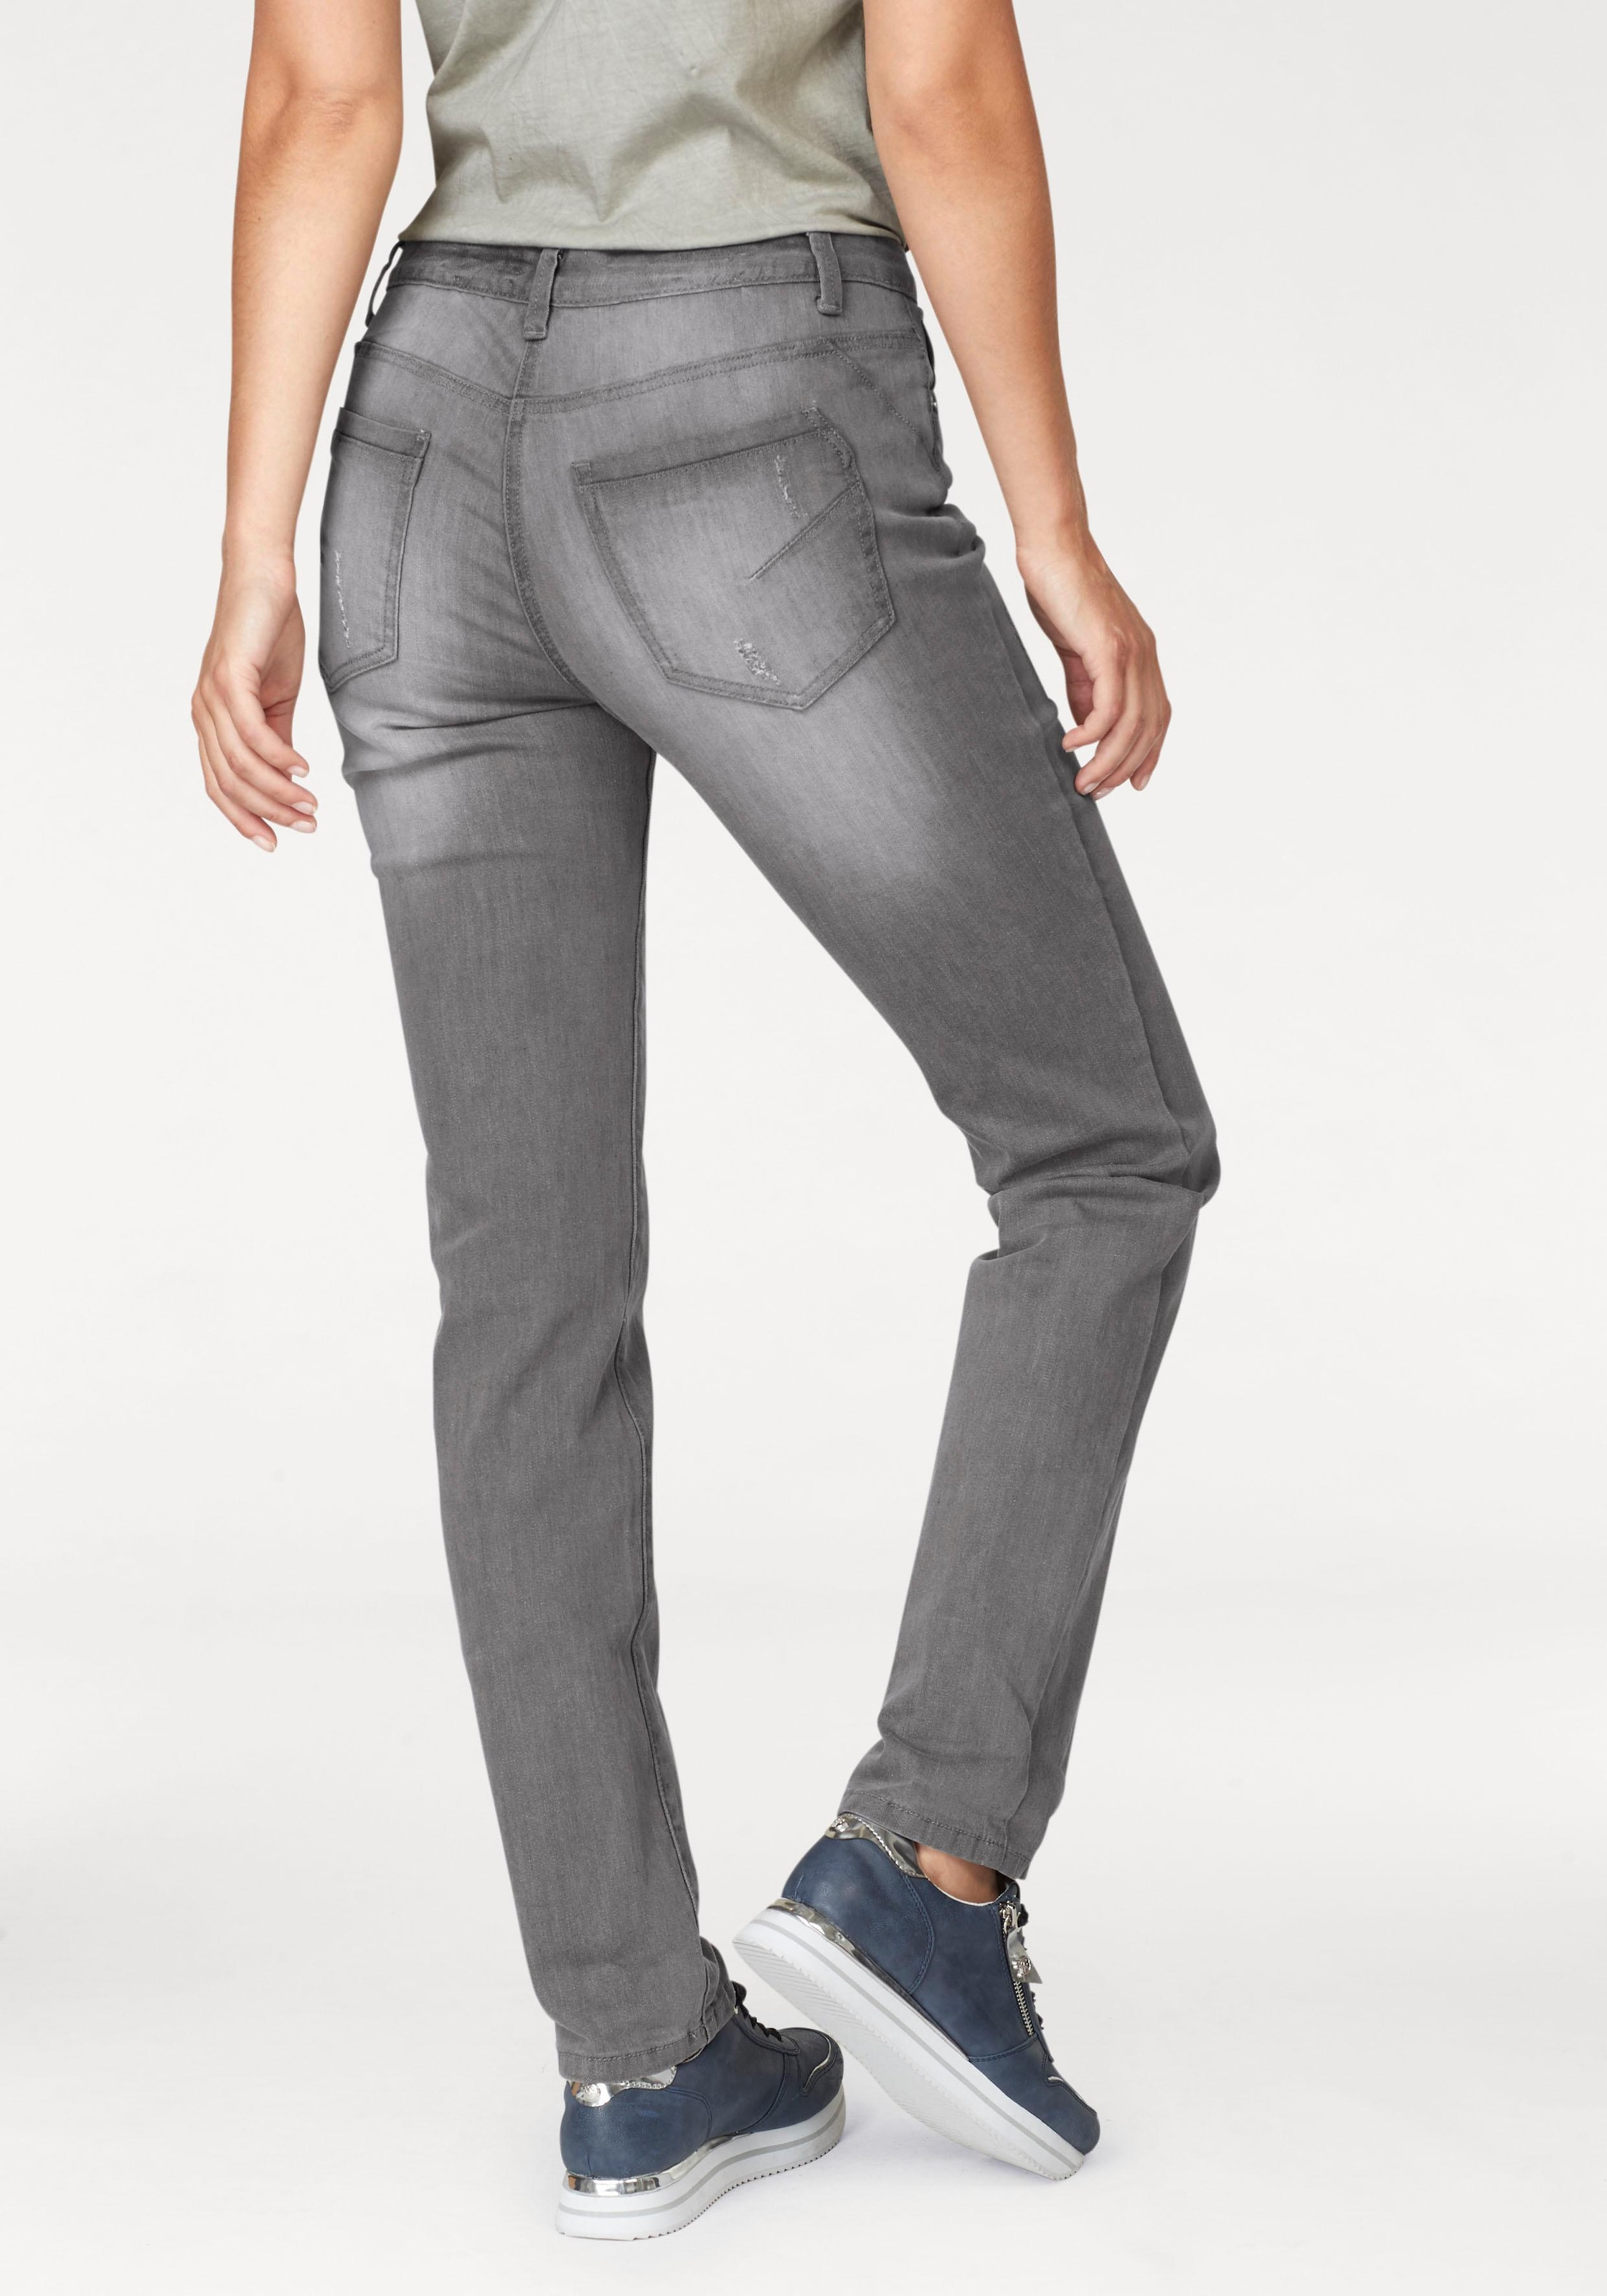 Image of Aniston by BAUR Boyfriend-Jeans